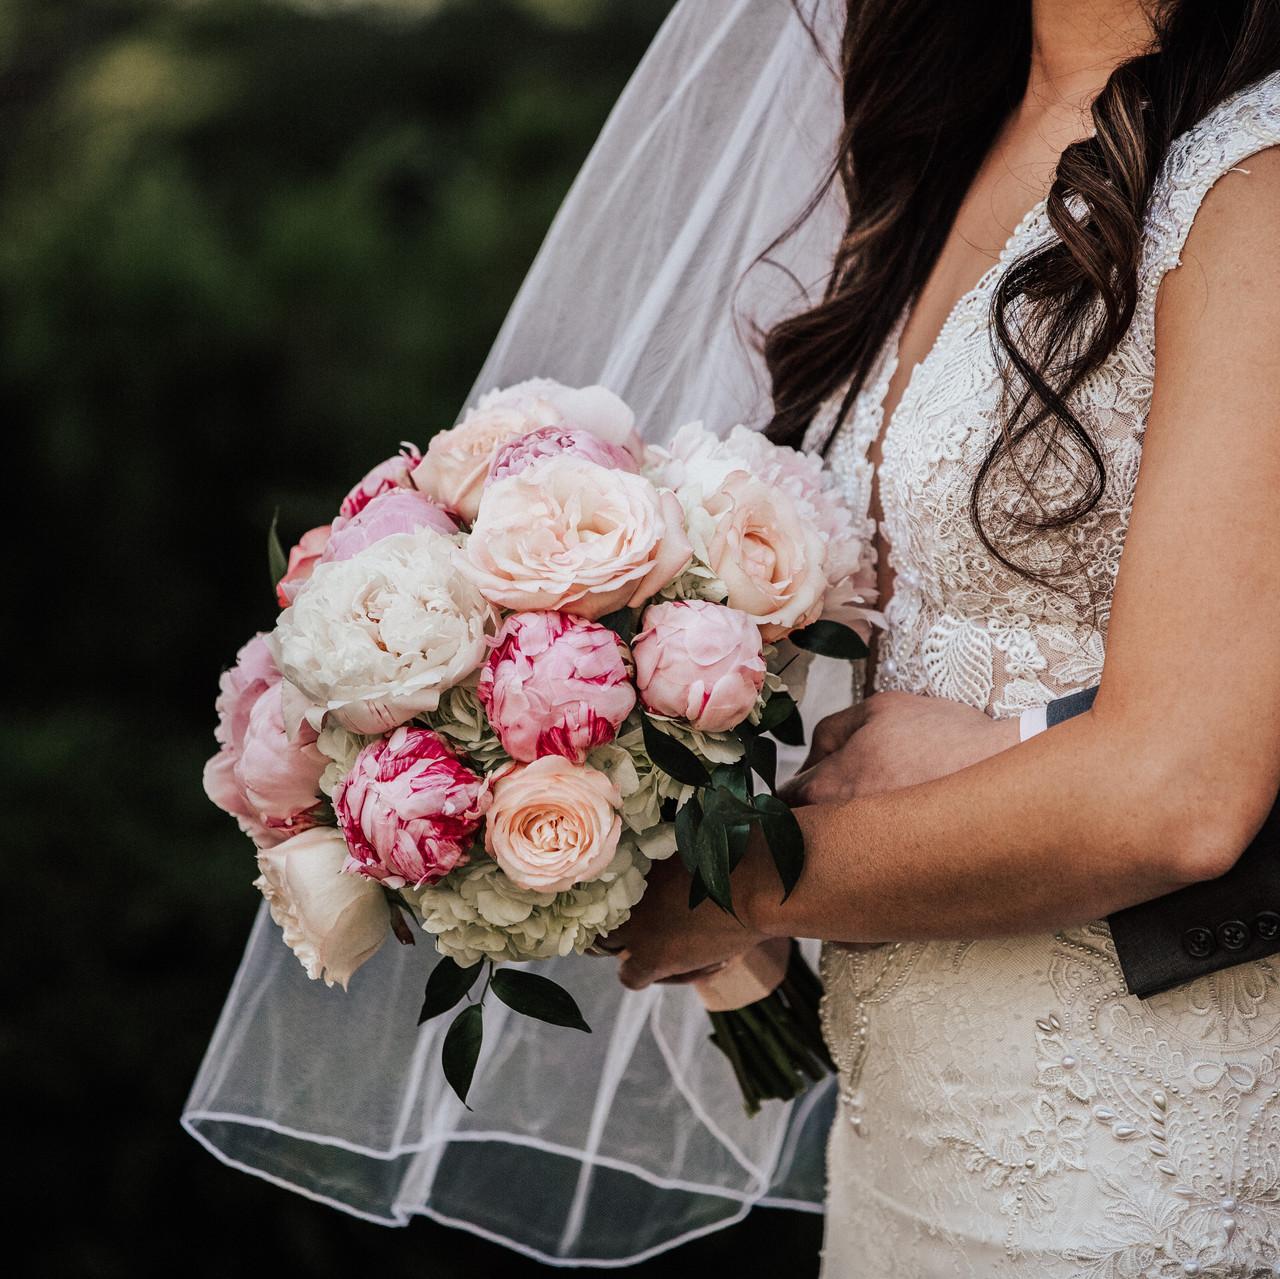 A-Floral-Affair-HYATT-LAKE-TAHOE-WEDDING-FLORIST (3)